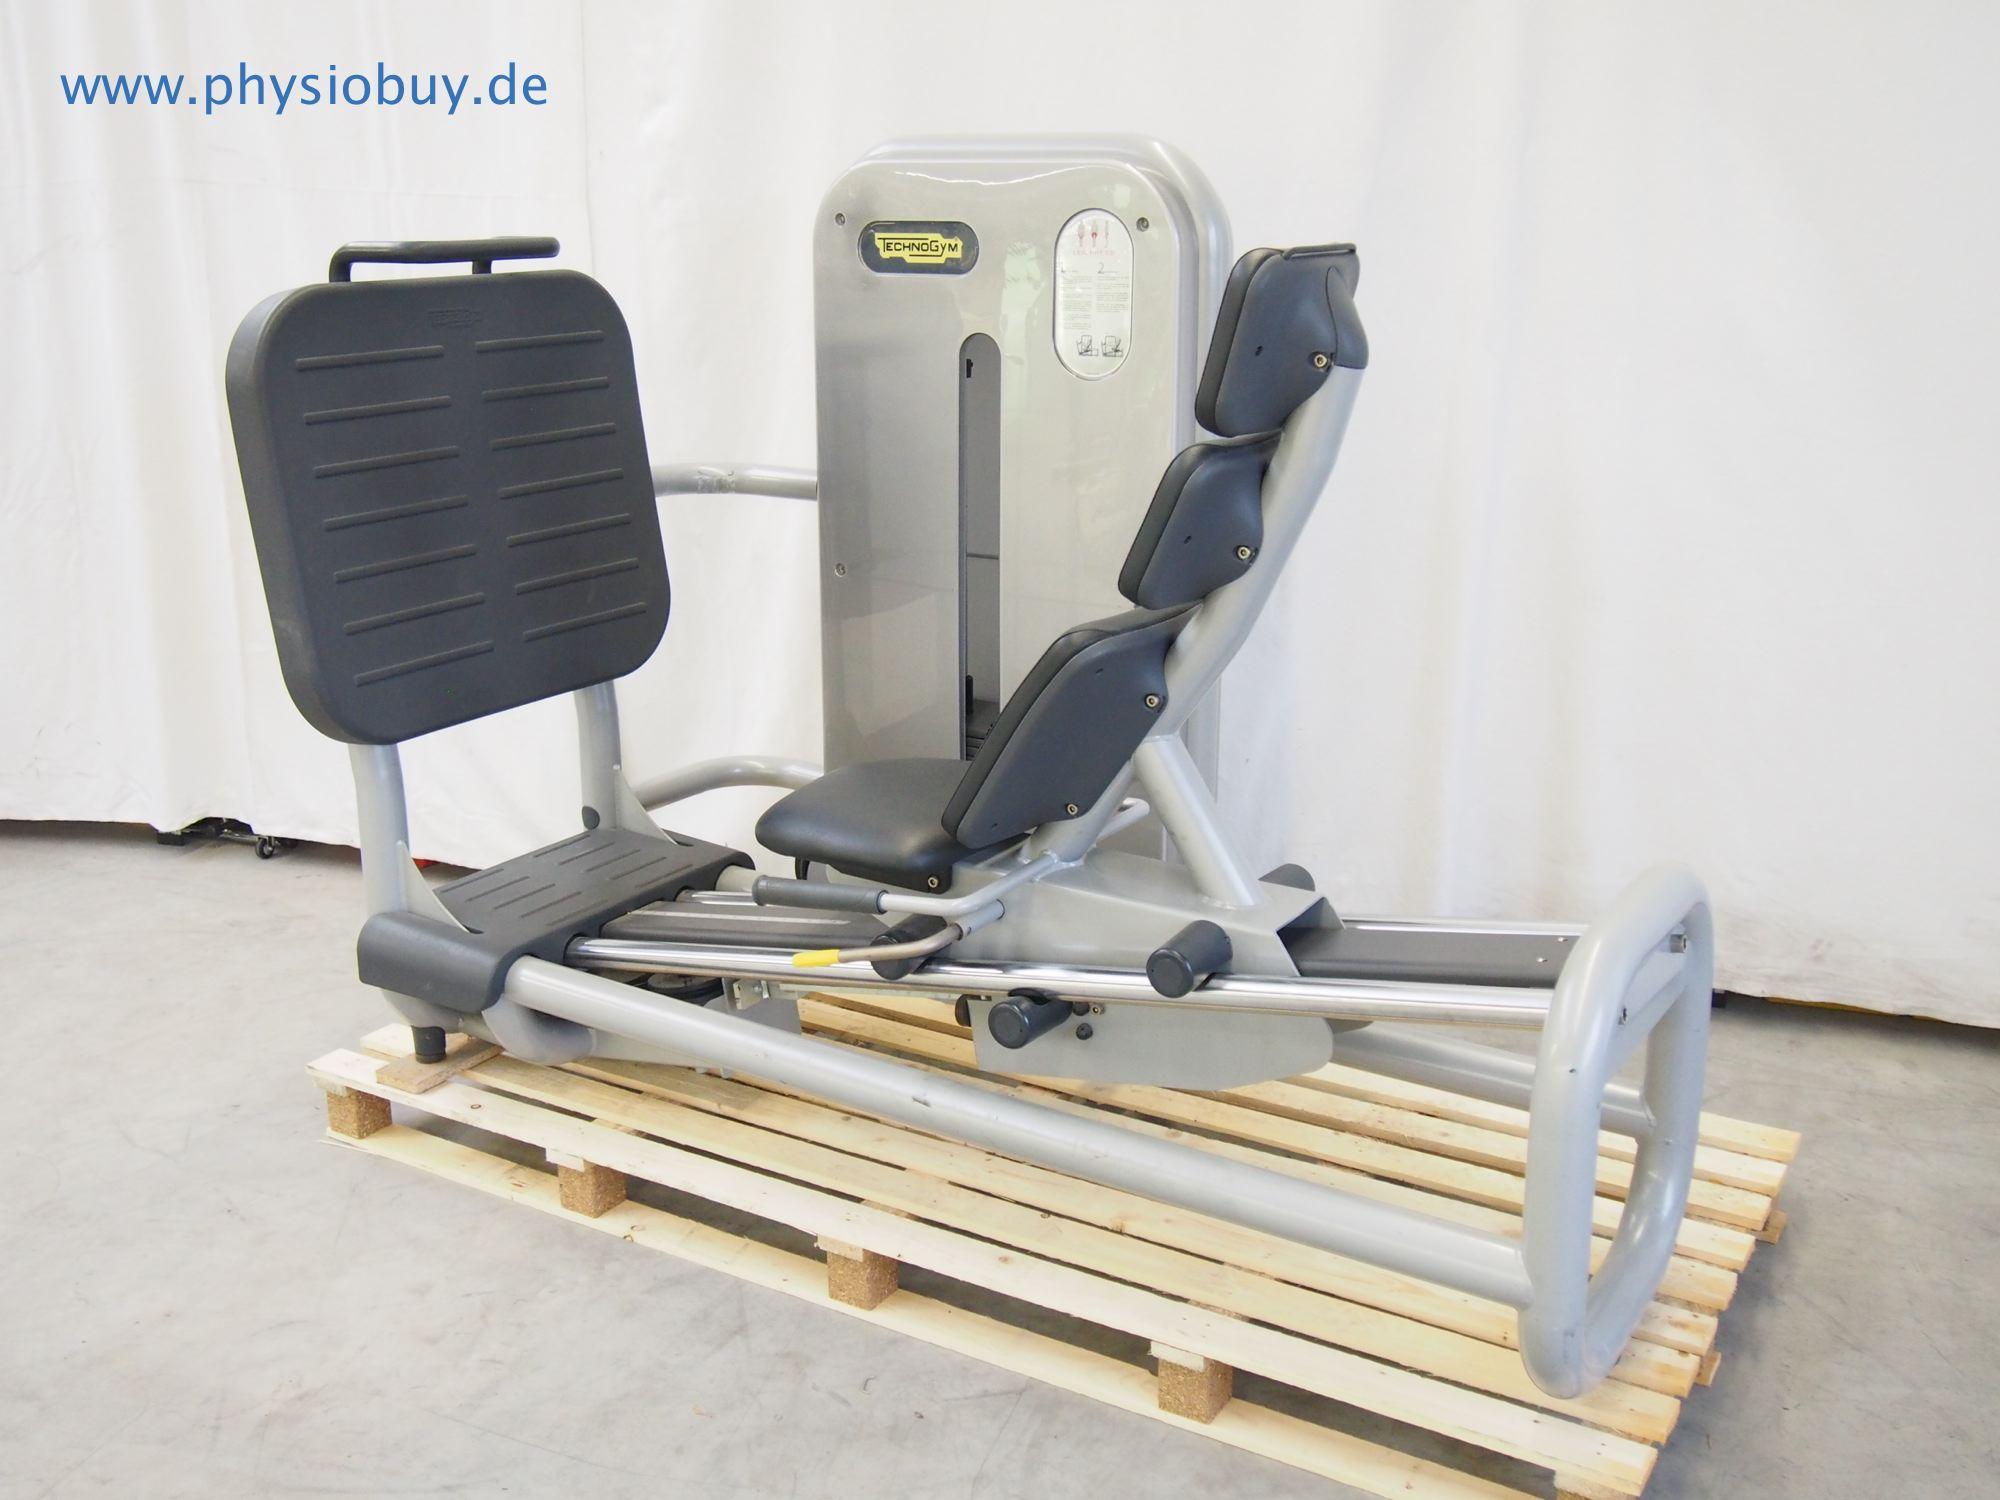 funktionsstemmen kraft cardioger te therapieliegen behandlungsliegen und fitnessger te. Black Bedroom Furniture Sets. Home Design Ideas